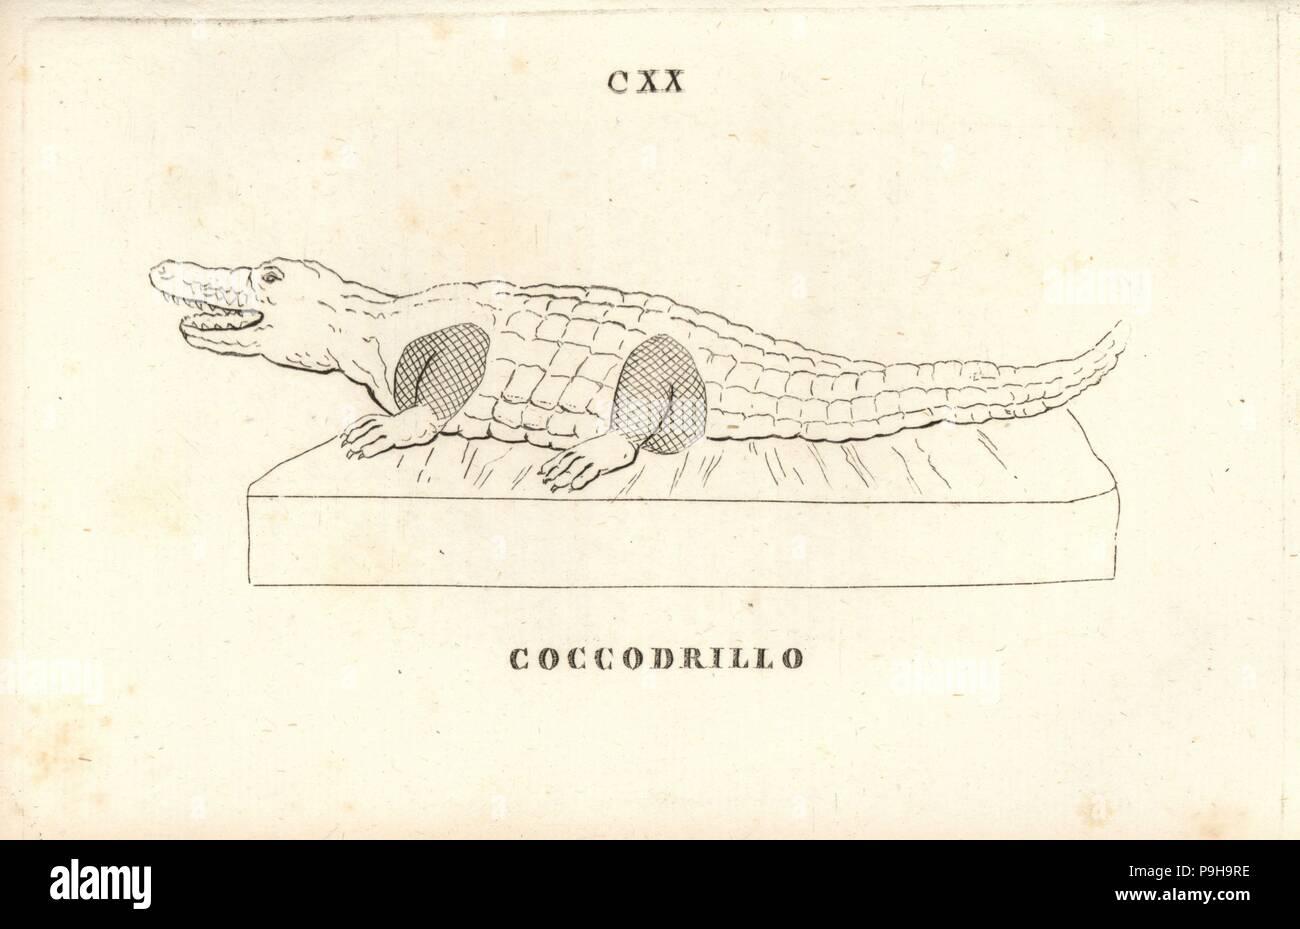 Statue of a crocodile. Copperplate engraving from Pietro Paolo Montagnani-Mirabili's Il Museo Capitolino (The Capitoline Museum), Rome, 1820. Stock Photo